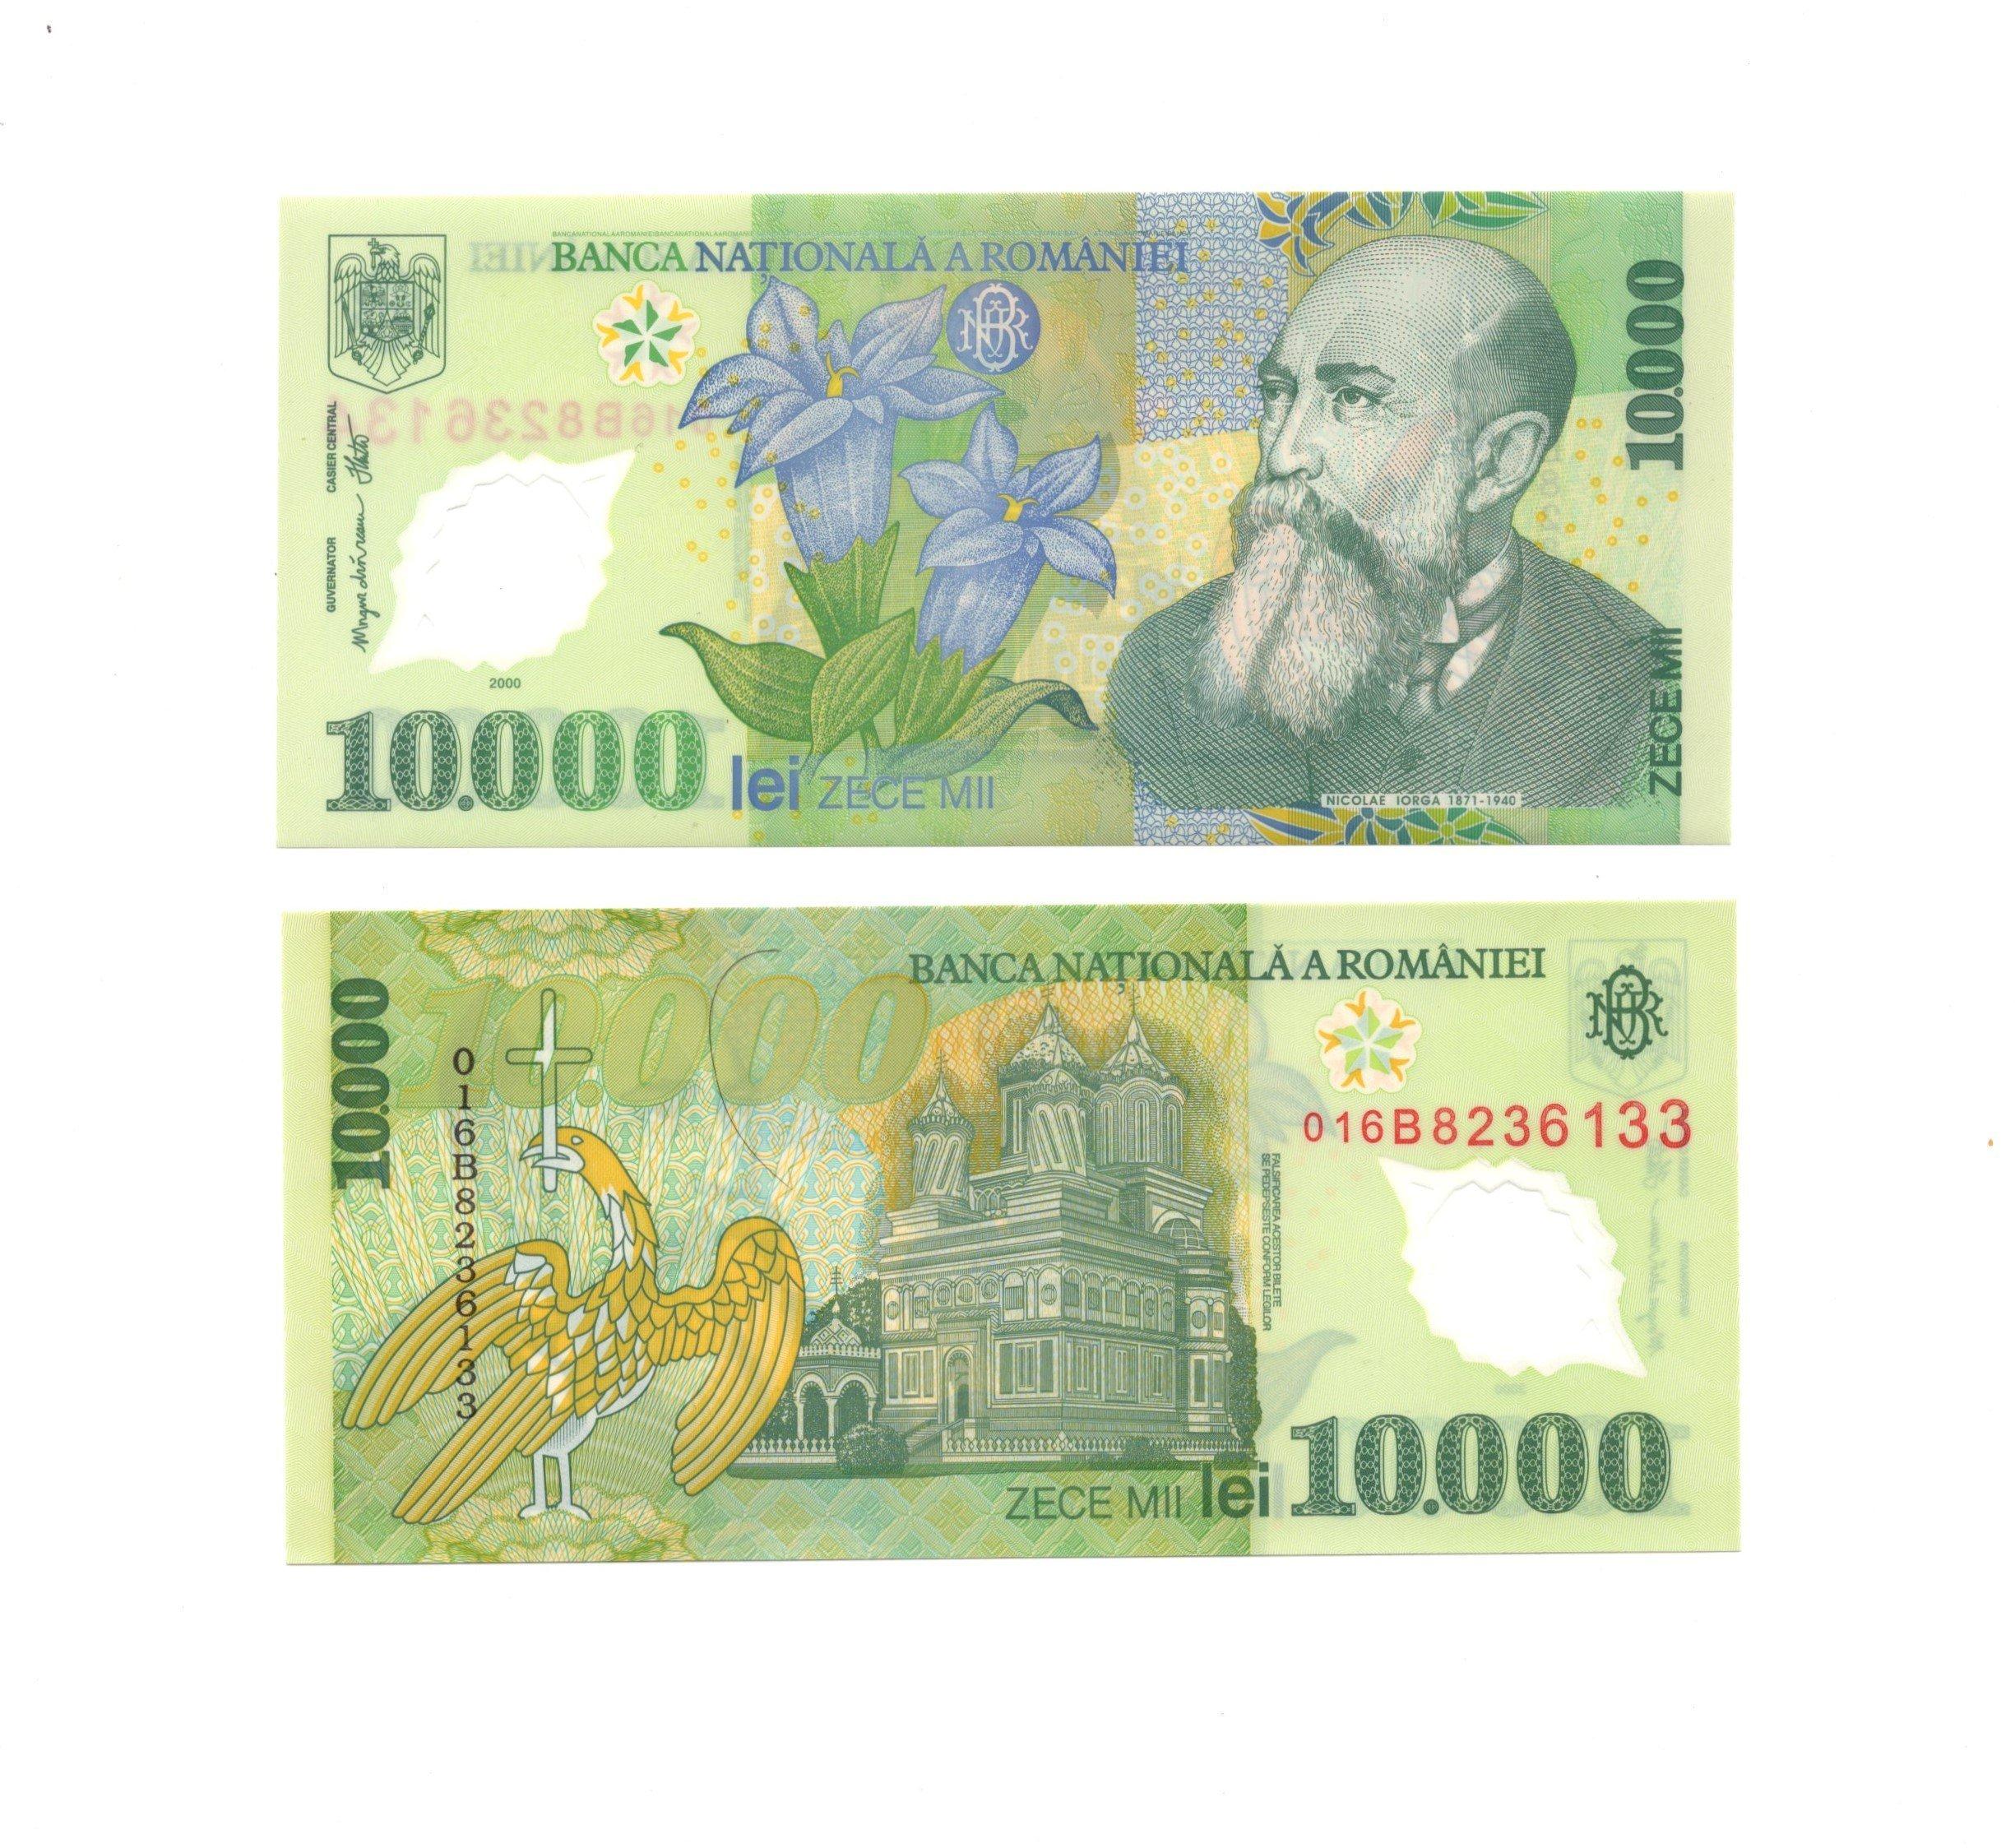 Romania 10000 lei